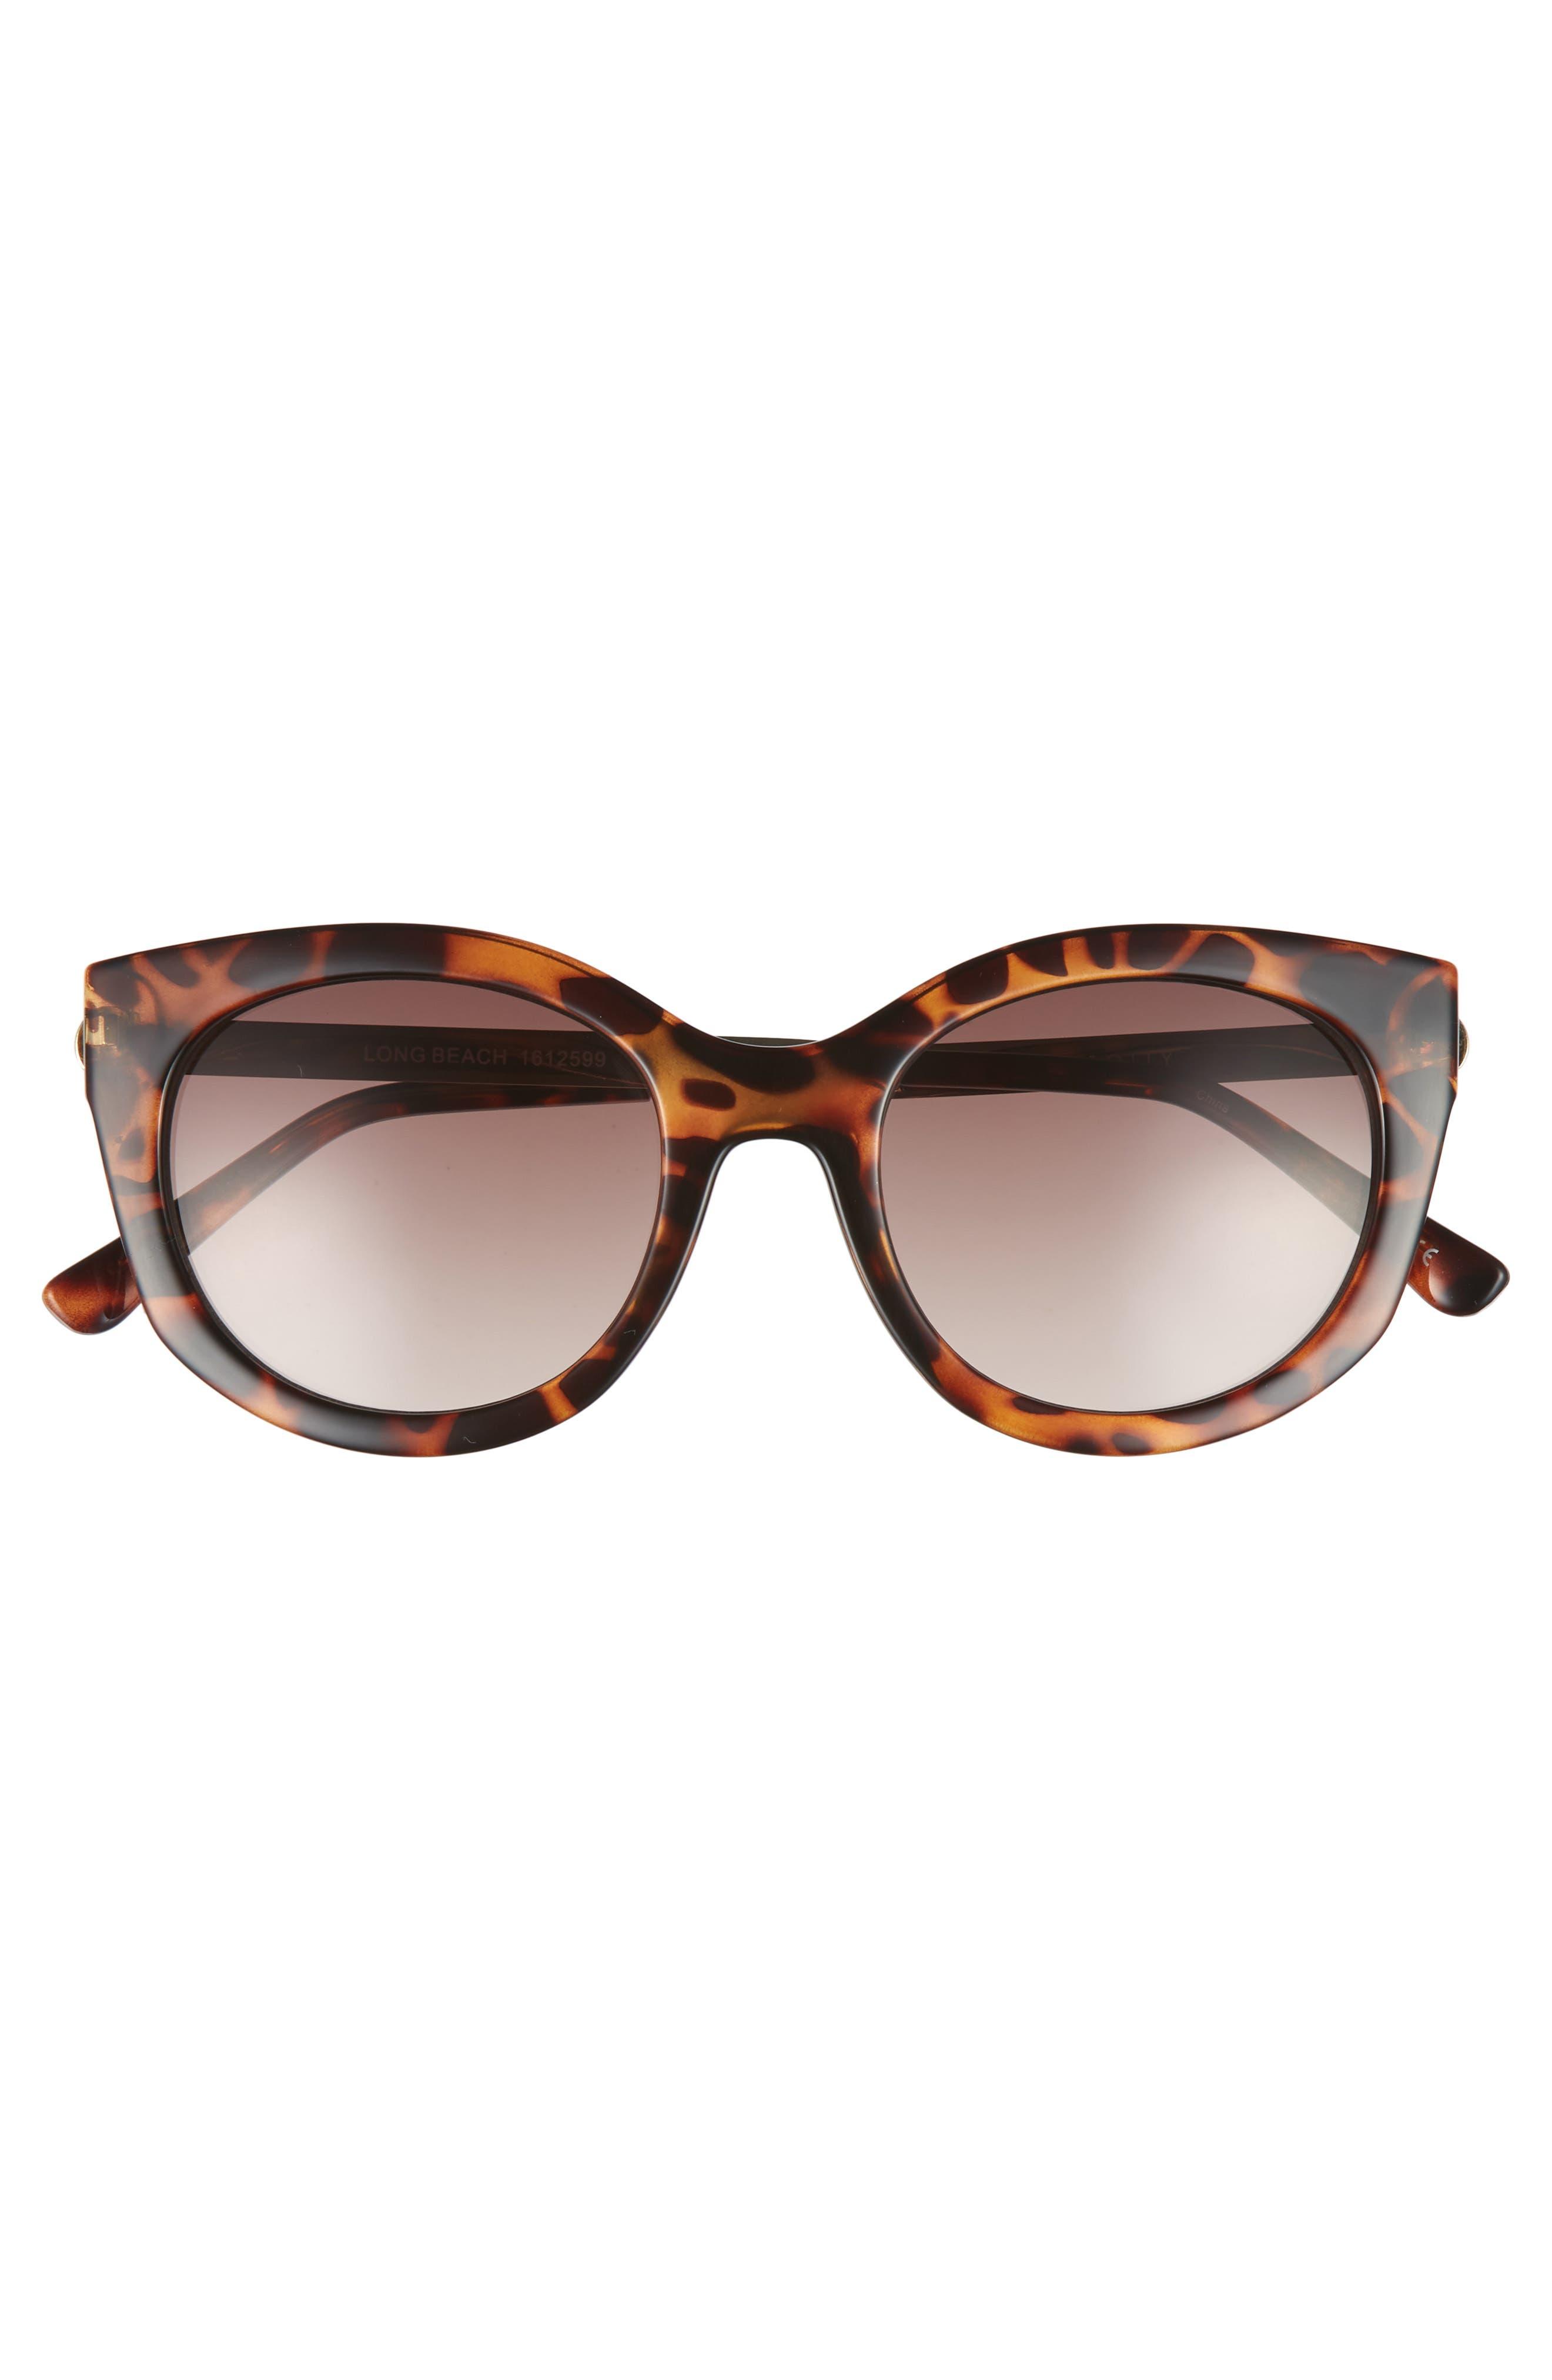 Long Beach 51mm Cat Eye Sunglasses,                             Alternate thumbnail 3, color,                             DARK TORT